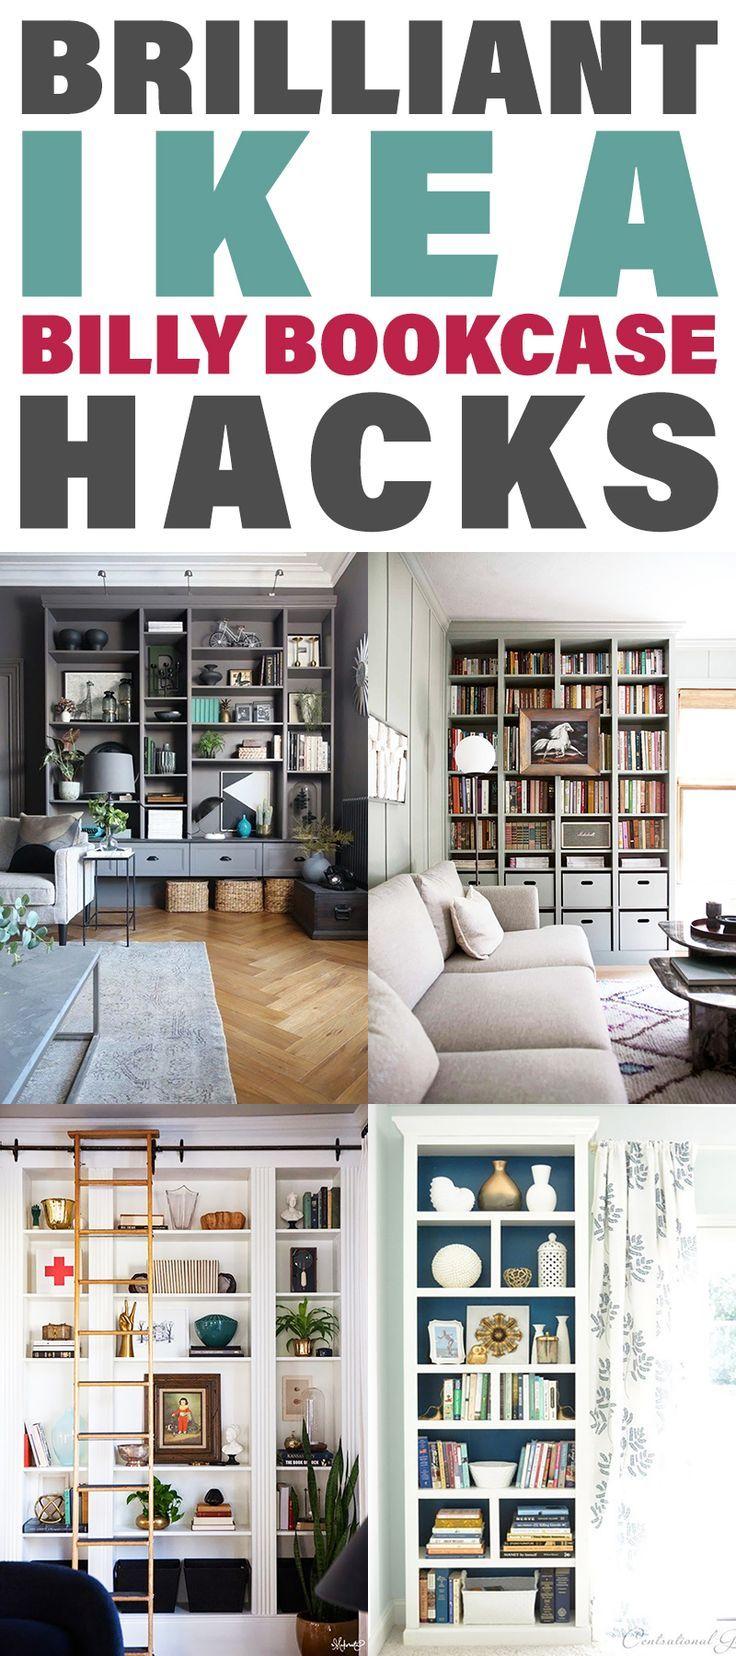 Brilliant IKEA Billy Bookcase Hacks images